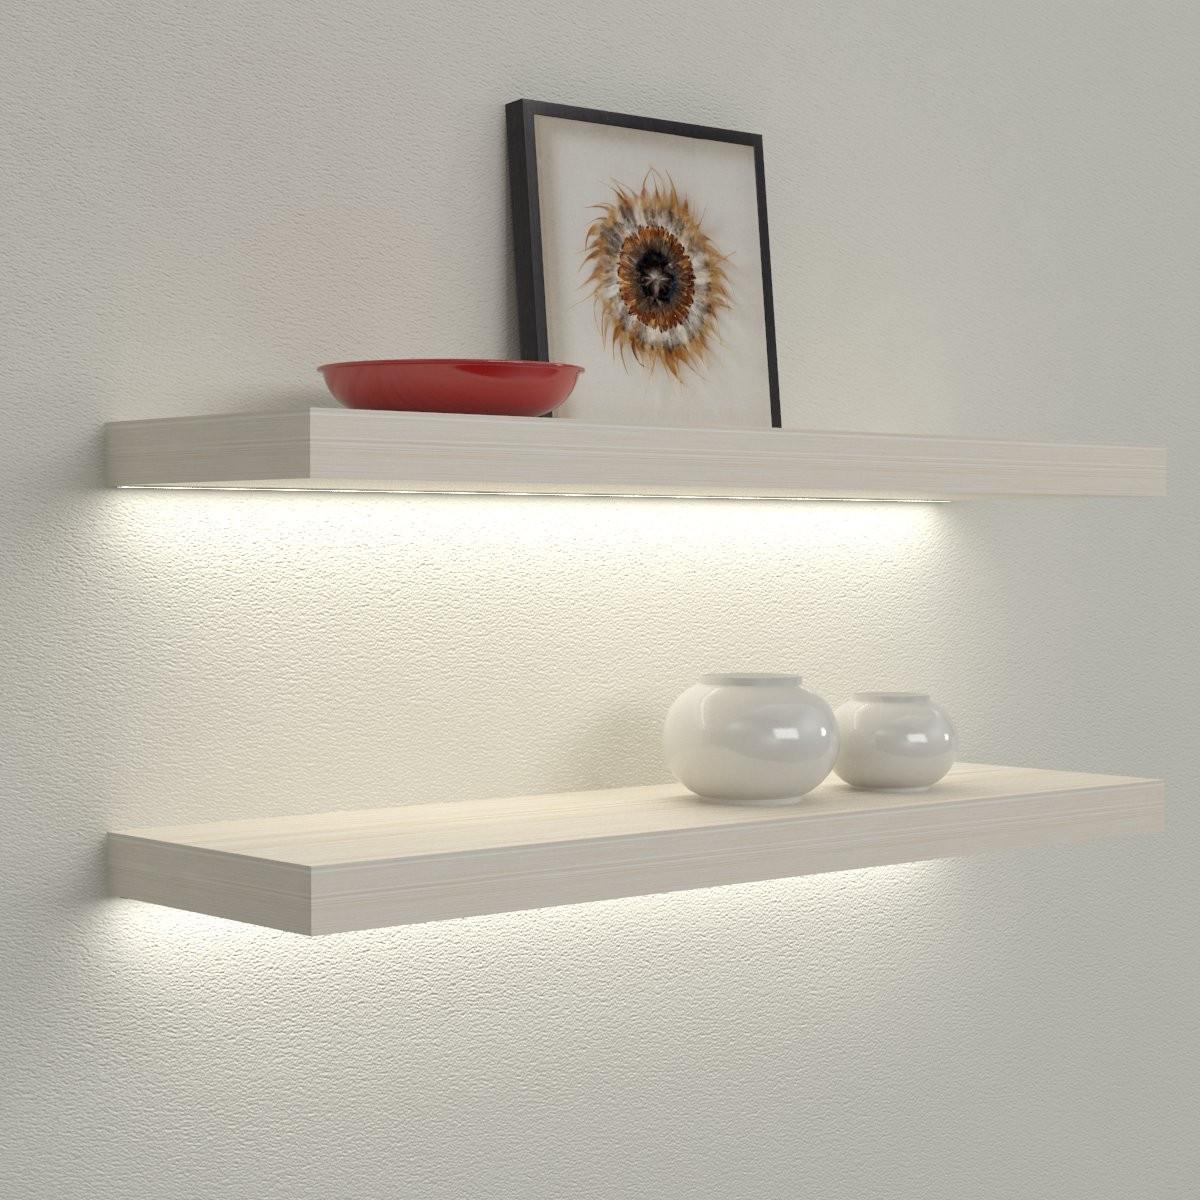 Led shelves lighted shelves illuminated shelves vecaetagere led shelves amipublicfo Image collections